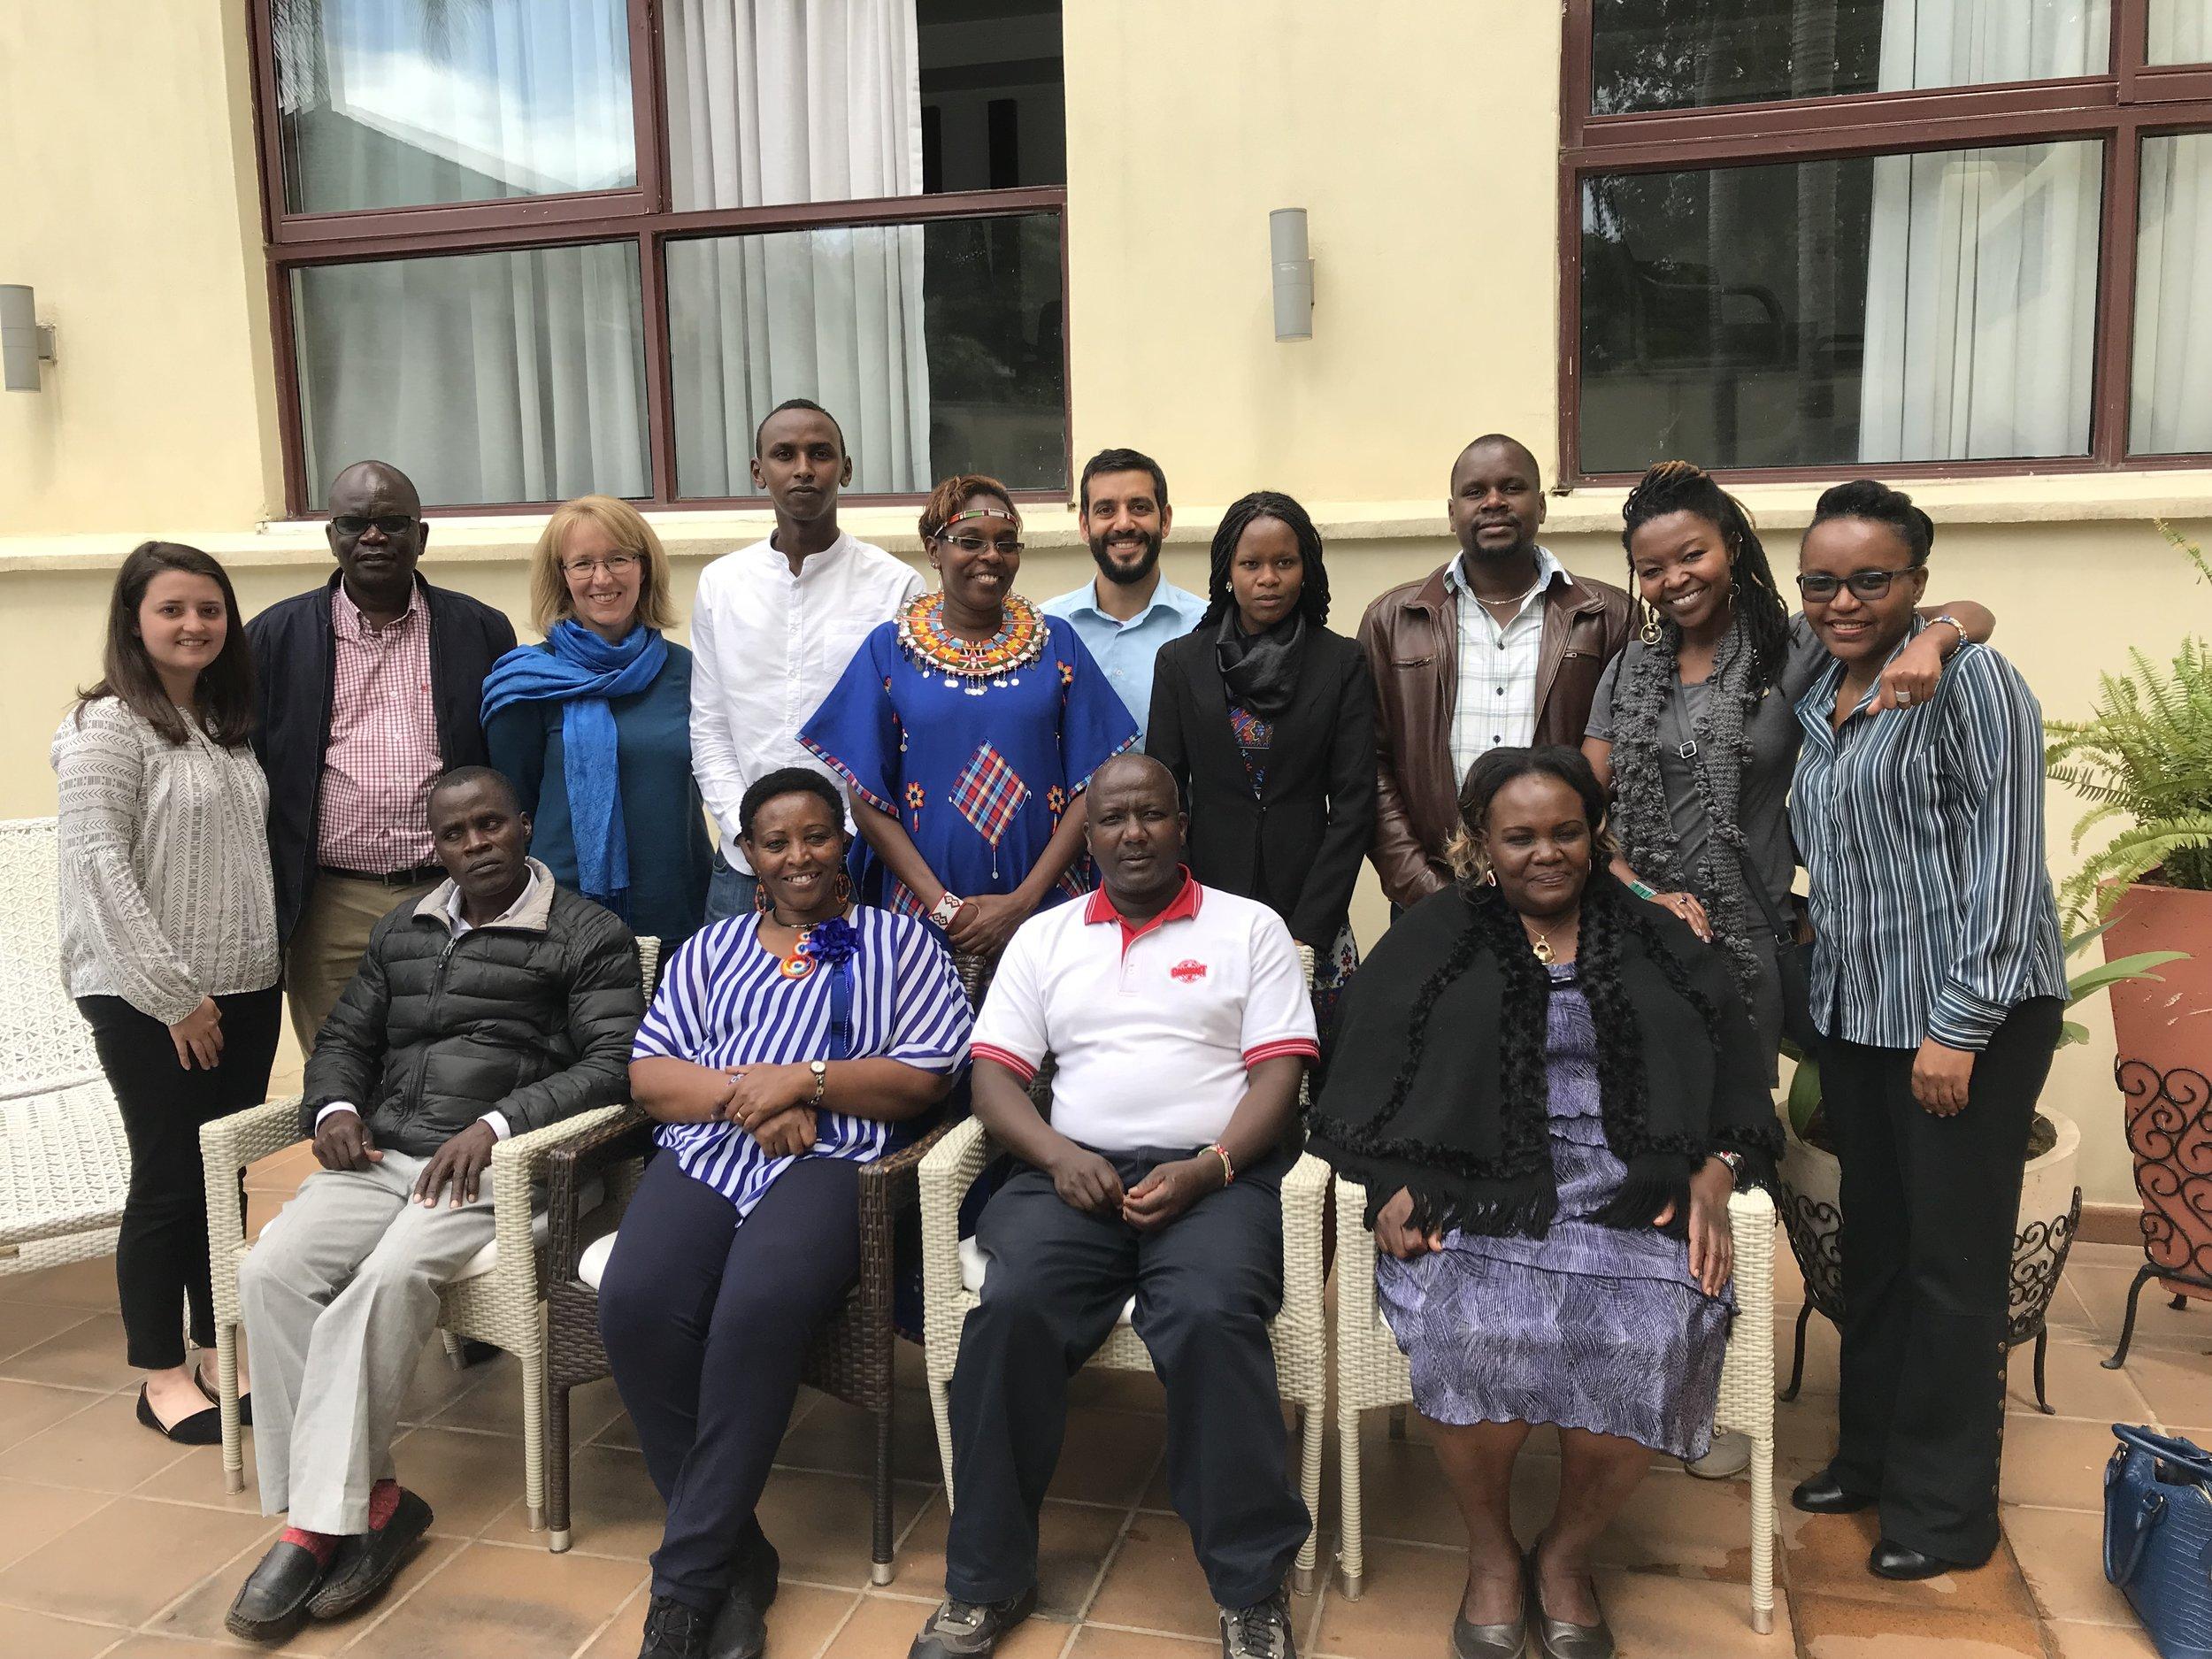 From Left to Right Bottom Row:  Kisilu Musya ( Thank You For The Rain ), Agnes Leina ( Il'laramatak Community Concerns ), John Tingoi ( IMPACT ), Violet Shivutse ( Shibuye Community Health Workers )   From Left to Right Top Row:  Hilary Heath ( CJRF ), Nicholas Abuya ( Christian Aid Kenya ), Heather McGray ( CJRF ), Yussuf Bashir ( Haki Na Sheria ), Jane Meriwas ( Samburu Women Trust ), Gino Cocchiaro ( Natural Justice ), Elizabeth Silakan ( IMPACT ), Dr. John Kitui ( Christian Aid Kenya ), Emily Wanja ( Docubox ), Rita Kahurananga ( Oak Foundation )